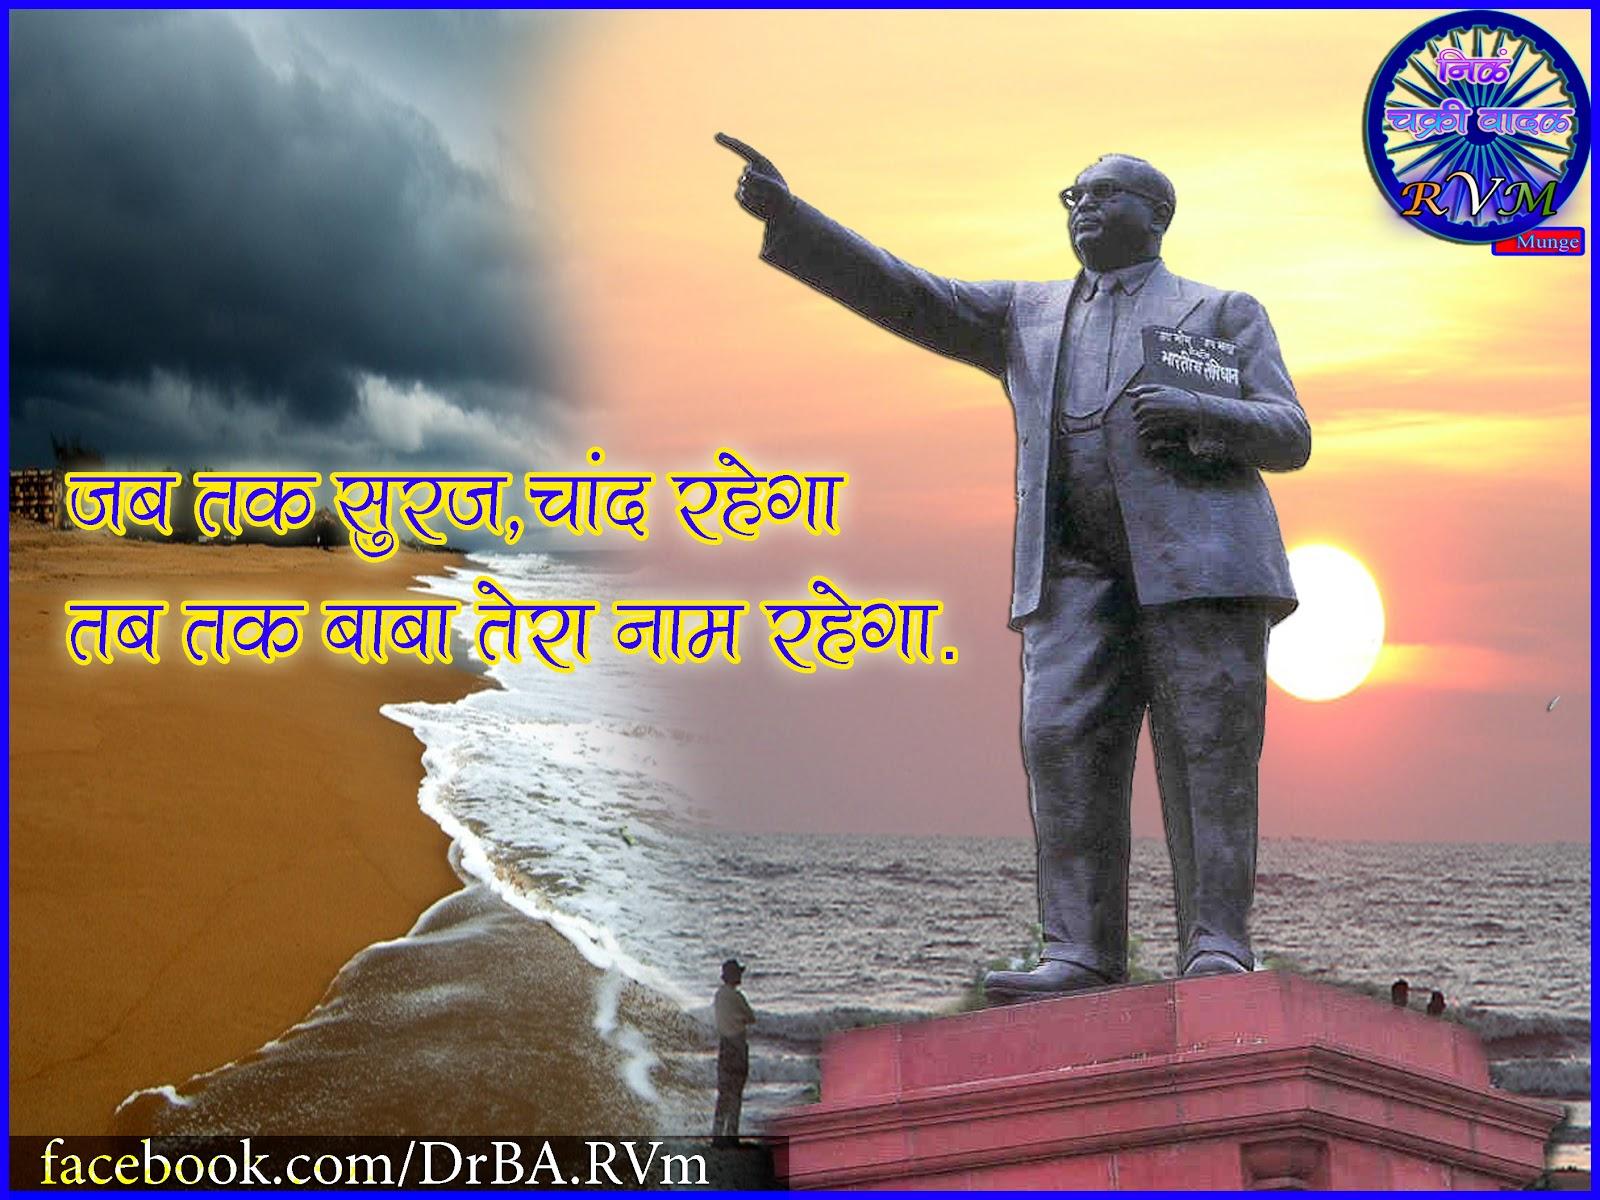 Mahaparinirvan Day Chaityabhoomi Dadar Mumbai hd wallpapers with quotes 6 december 1956 ...